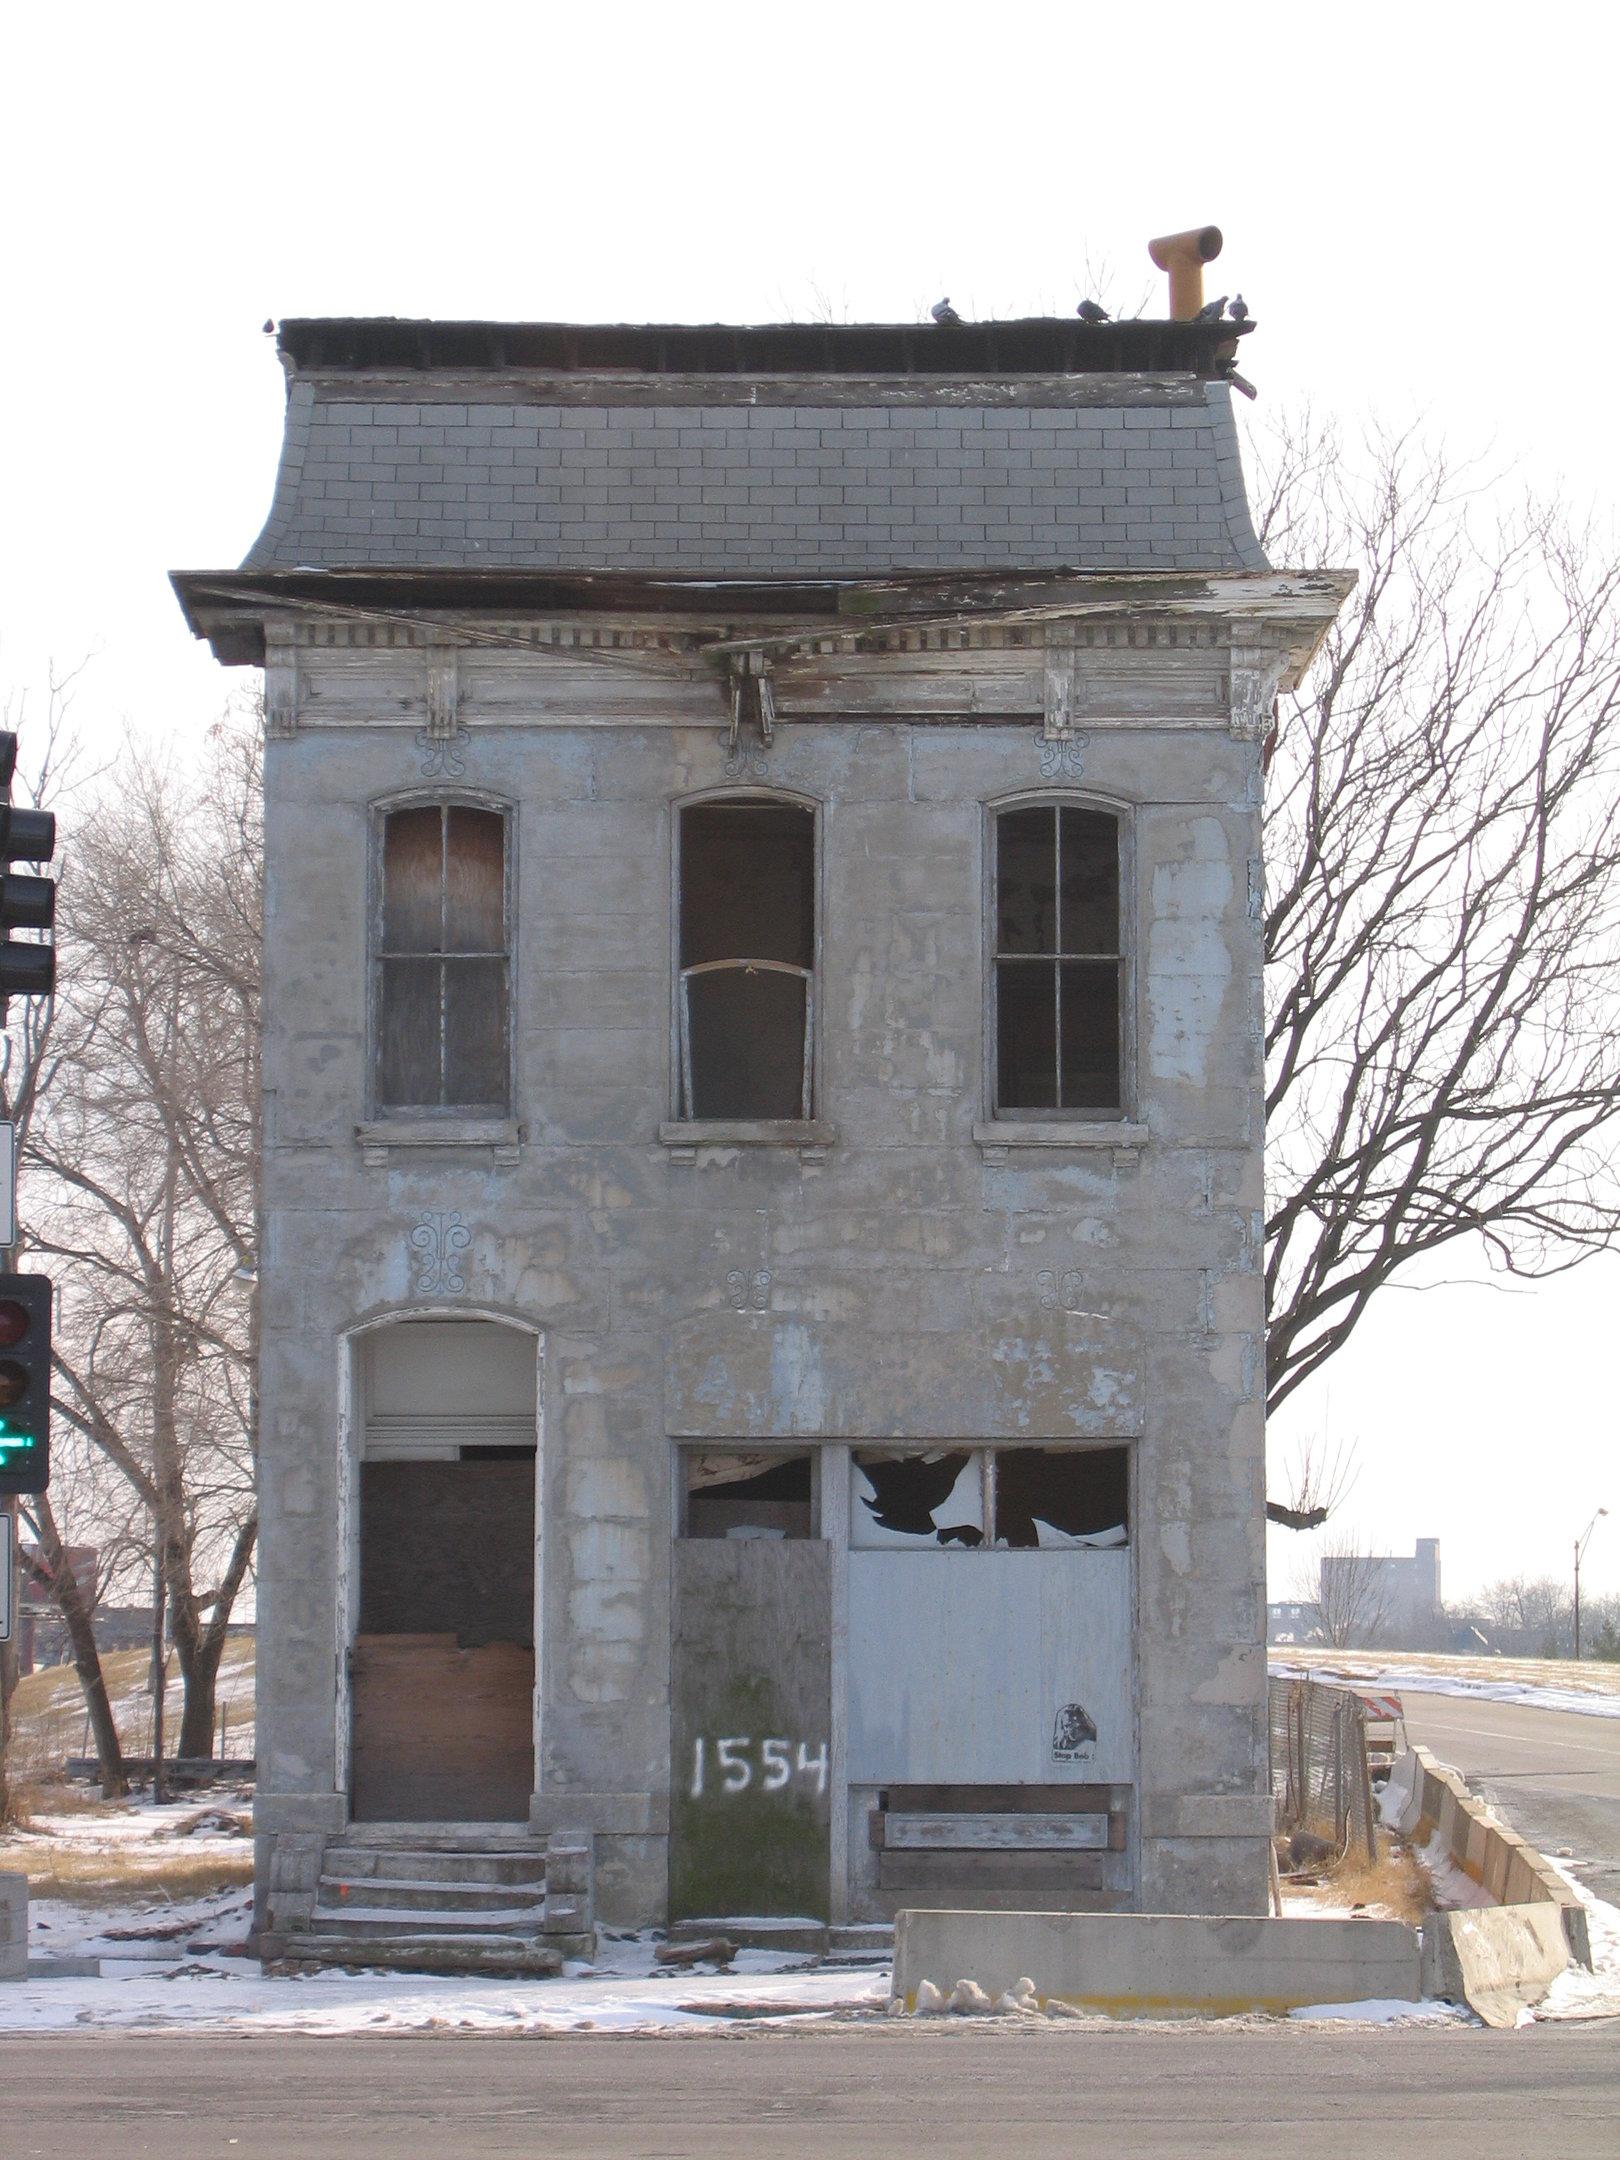 Abandoned House by digitalhomicide on DeviantArt